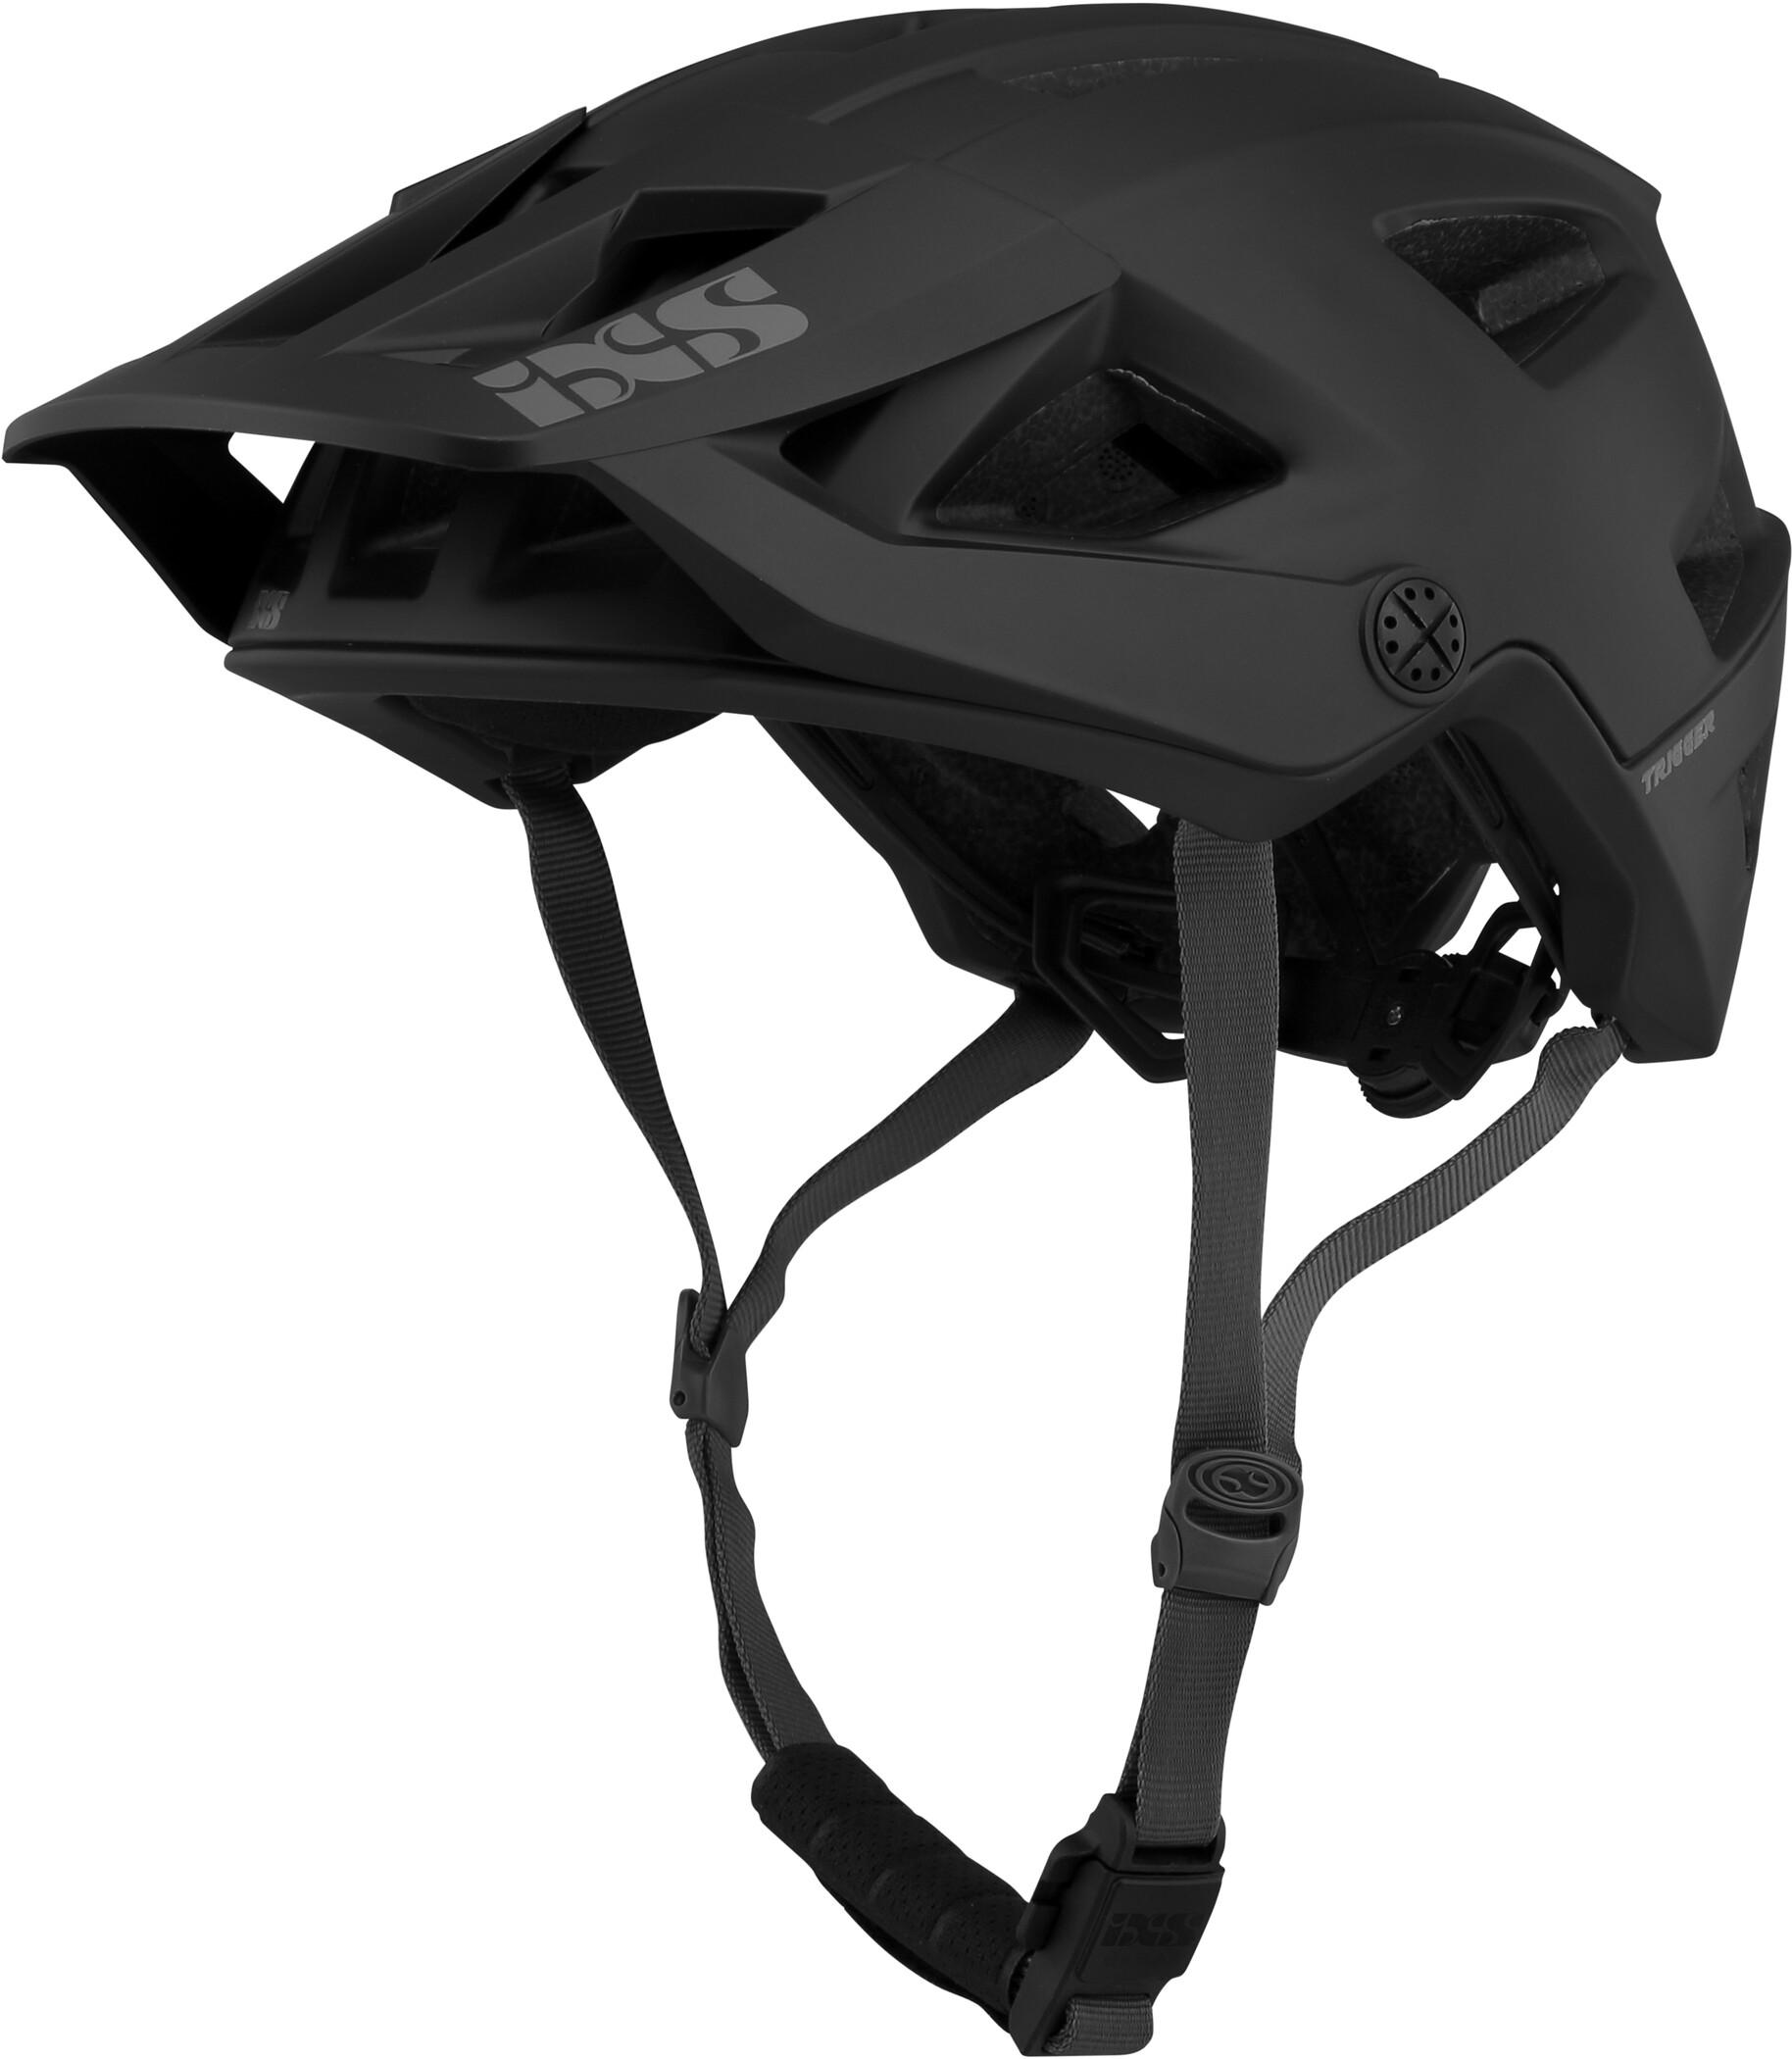 IXS Trigger AM Cykelhjelm, black (2019) | Helmets